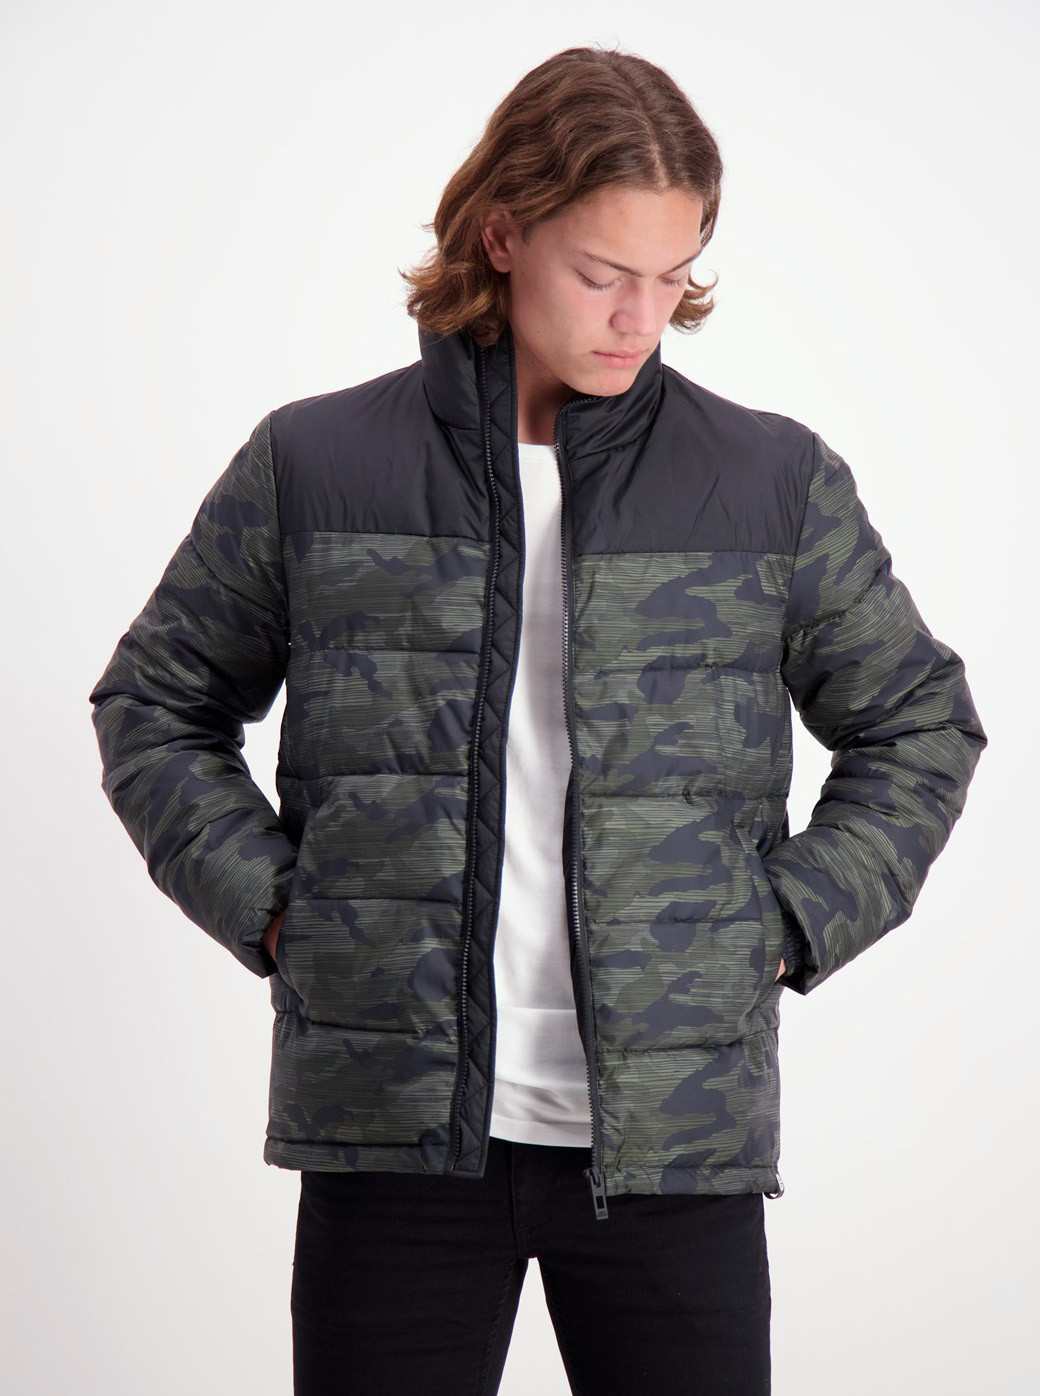 Shine Original Black-Green Patterned Winter Jacket